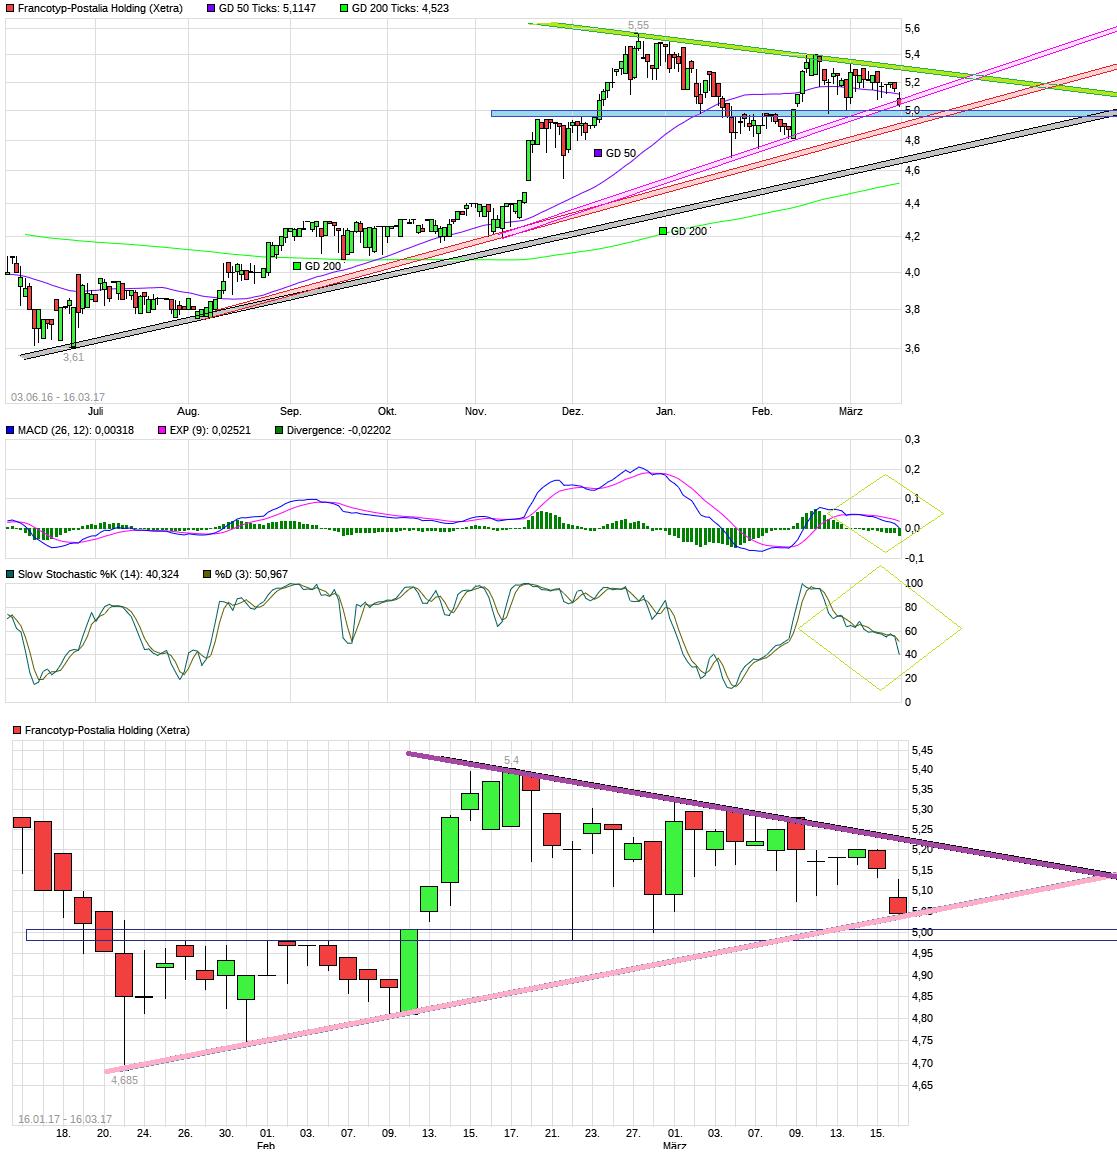 chart_free_francotyp-postaliaholding.png